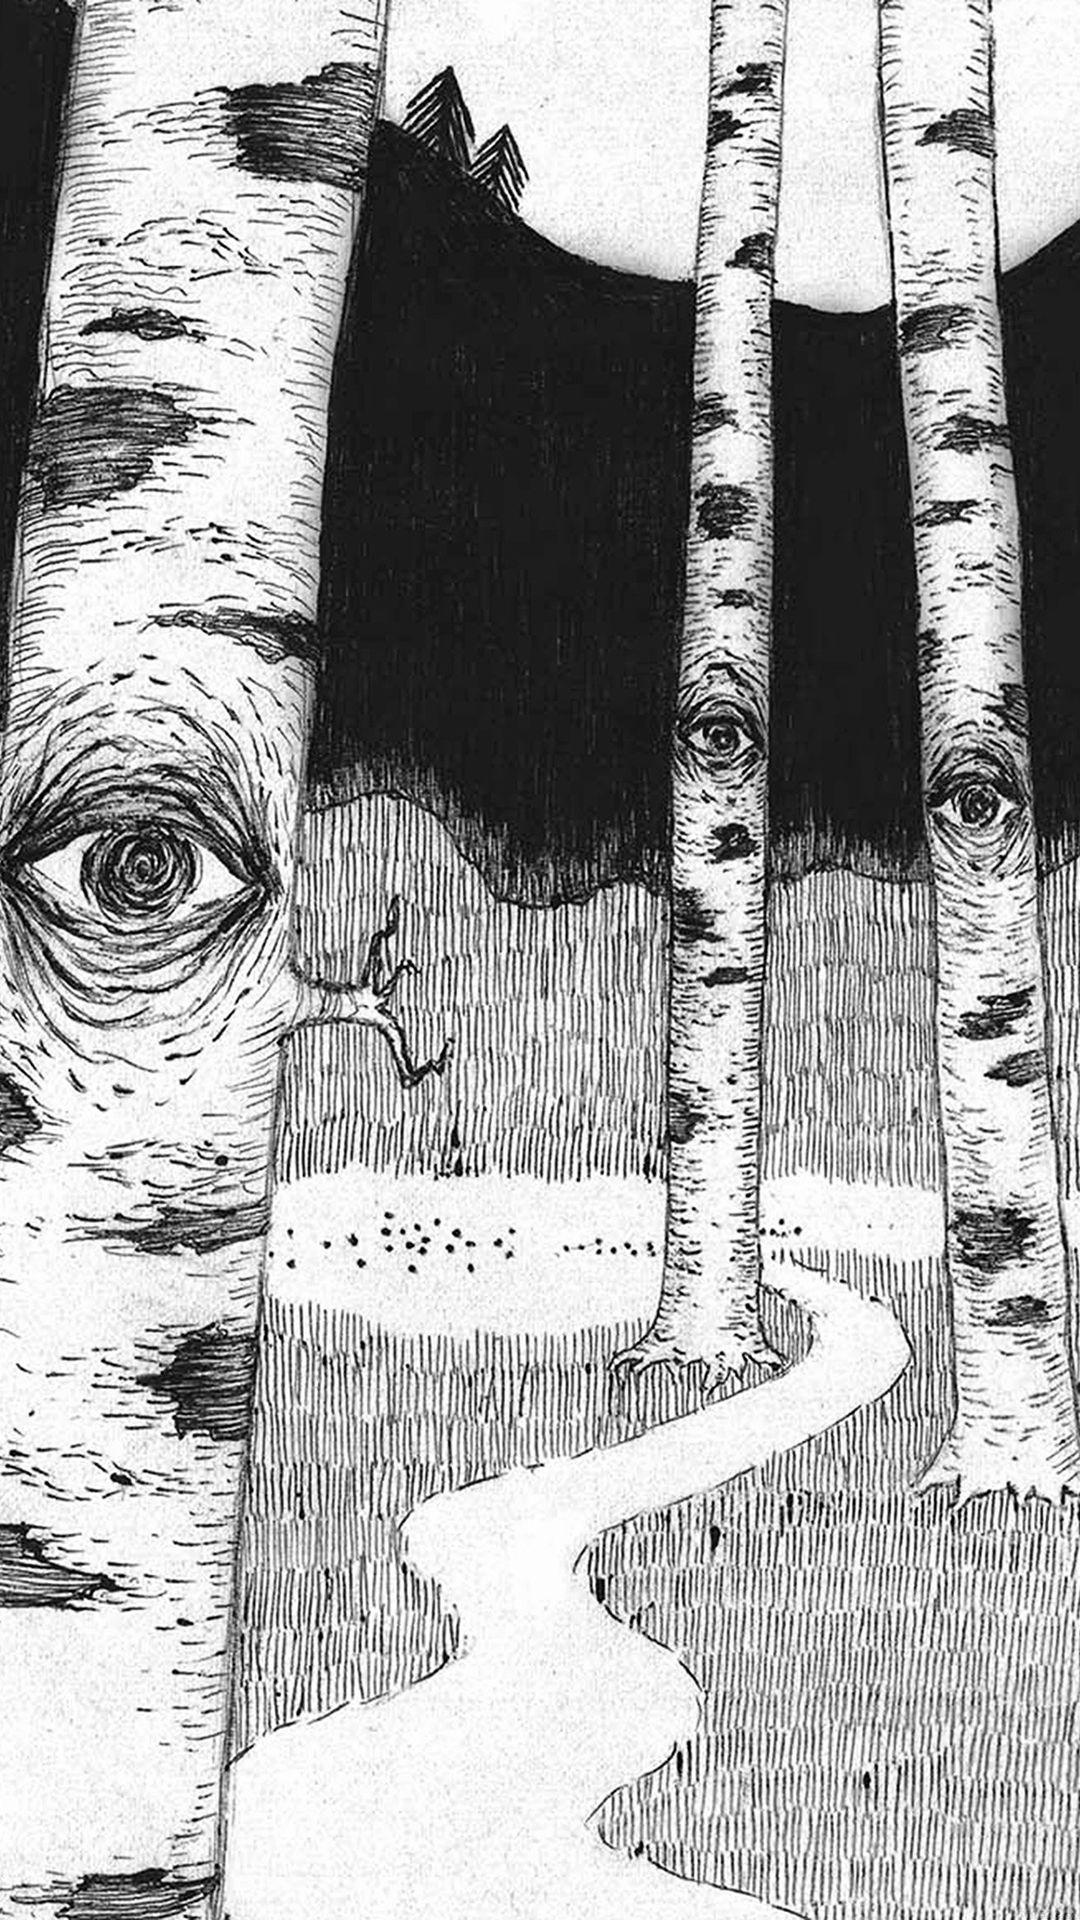 Eye in woods pencil drawing art illust iphone 6 wallpaper